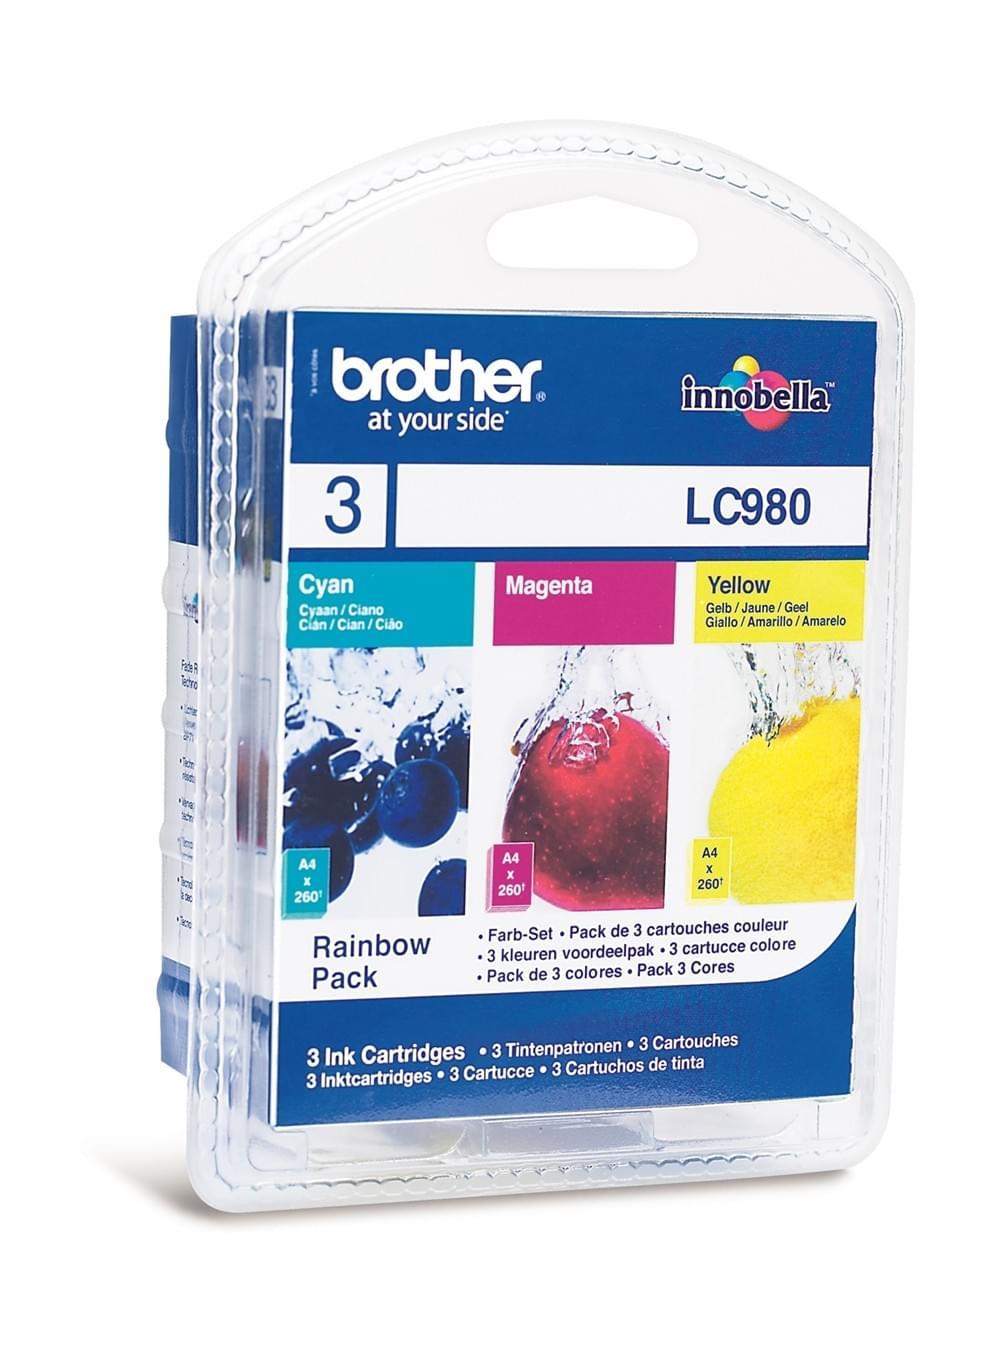 Pack couleur (Cyan Magenta Jaune) - LC980RBWBP pour imprimante Jet d'encre Brother - 0